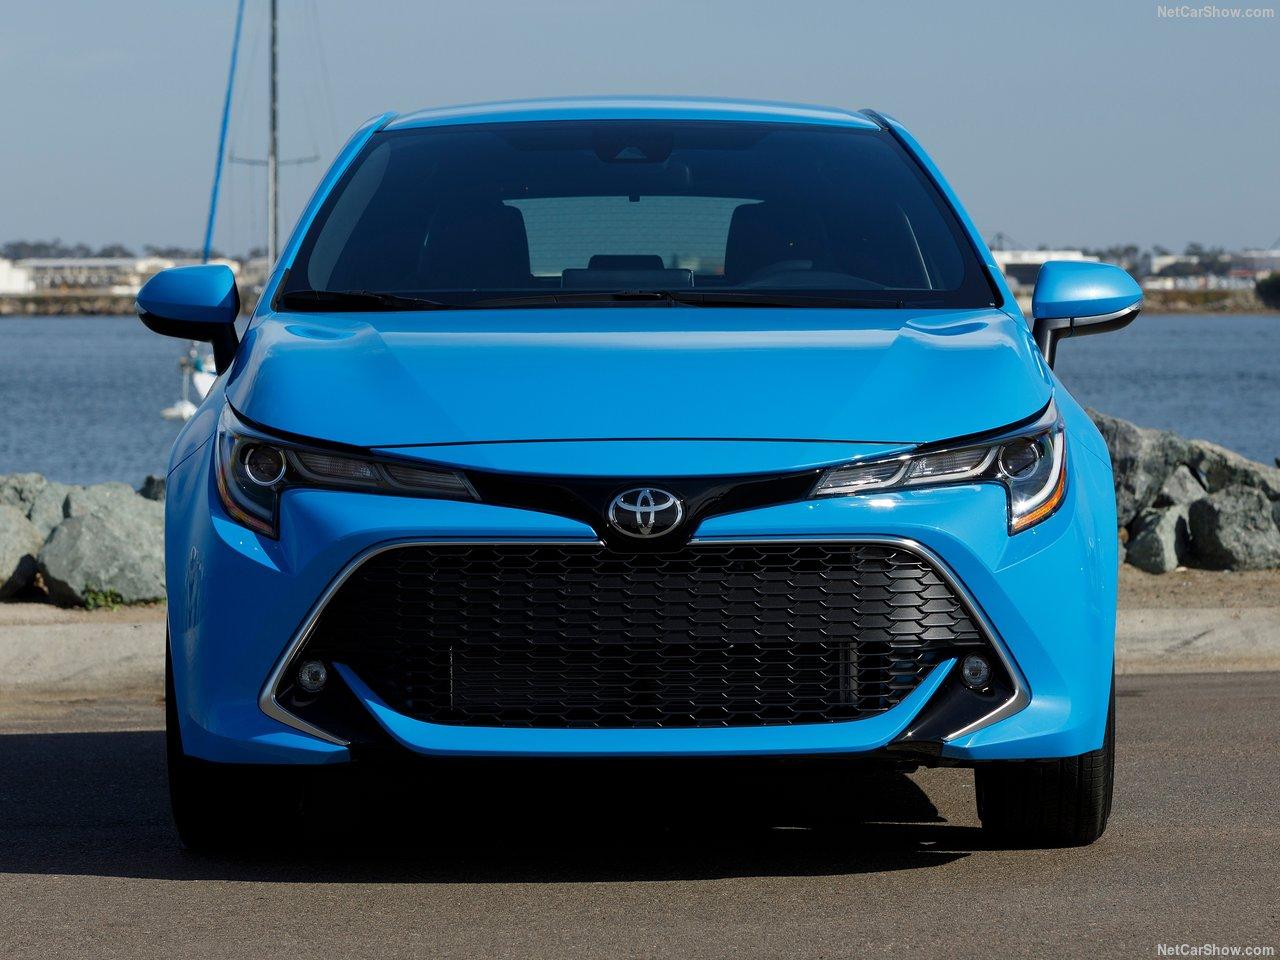 Toyota-Corolla_Hatchback-2019-1280-21.jpg